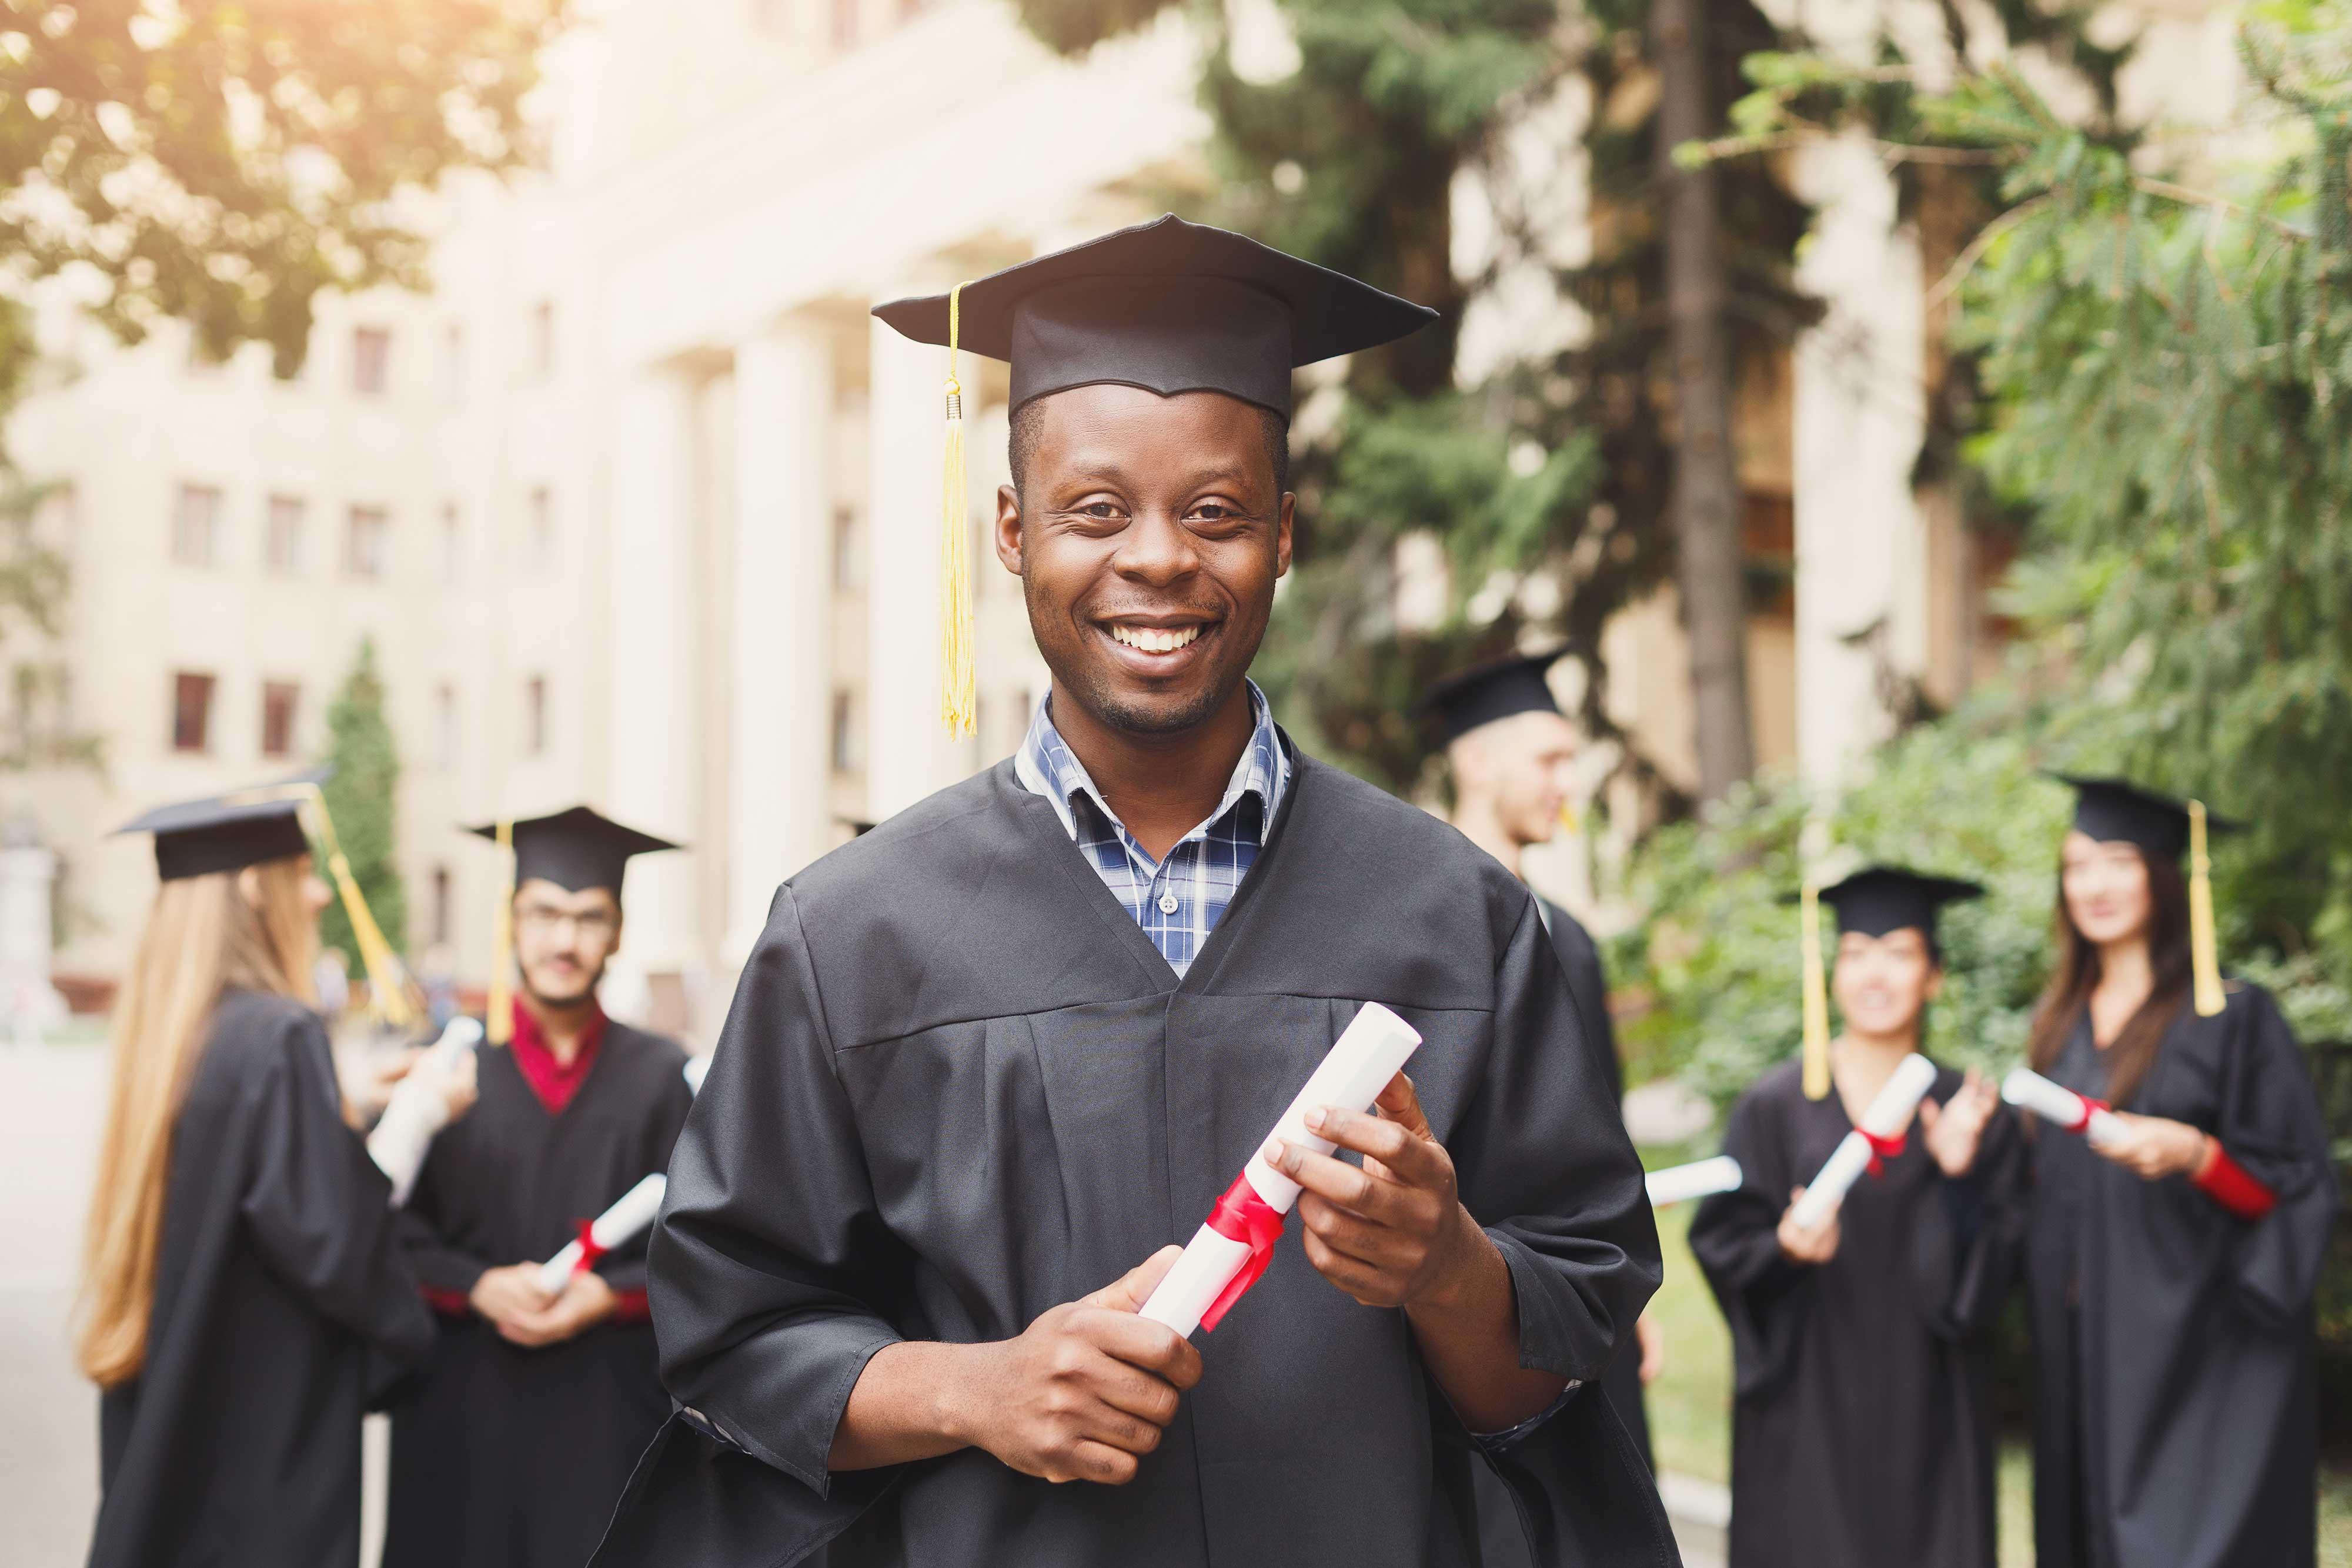 A Rural Retreat For High School Graduation Celebrations   Graduate holding diploma